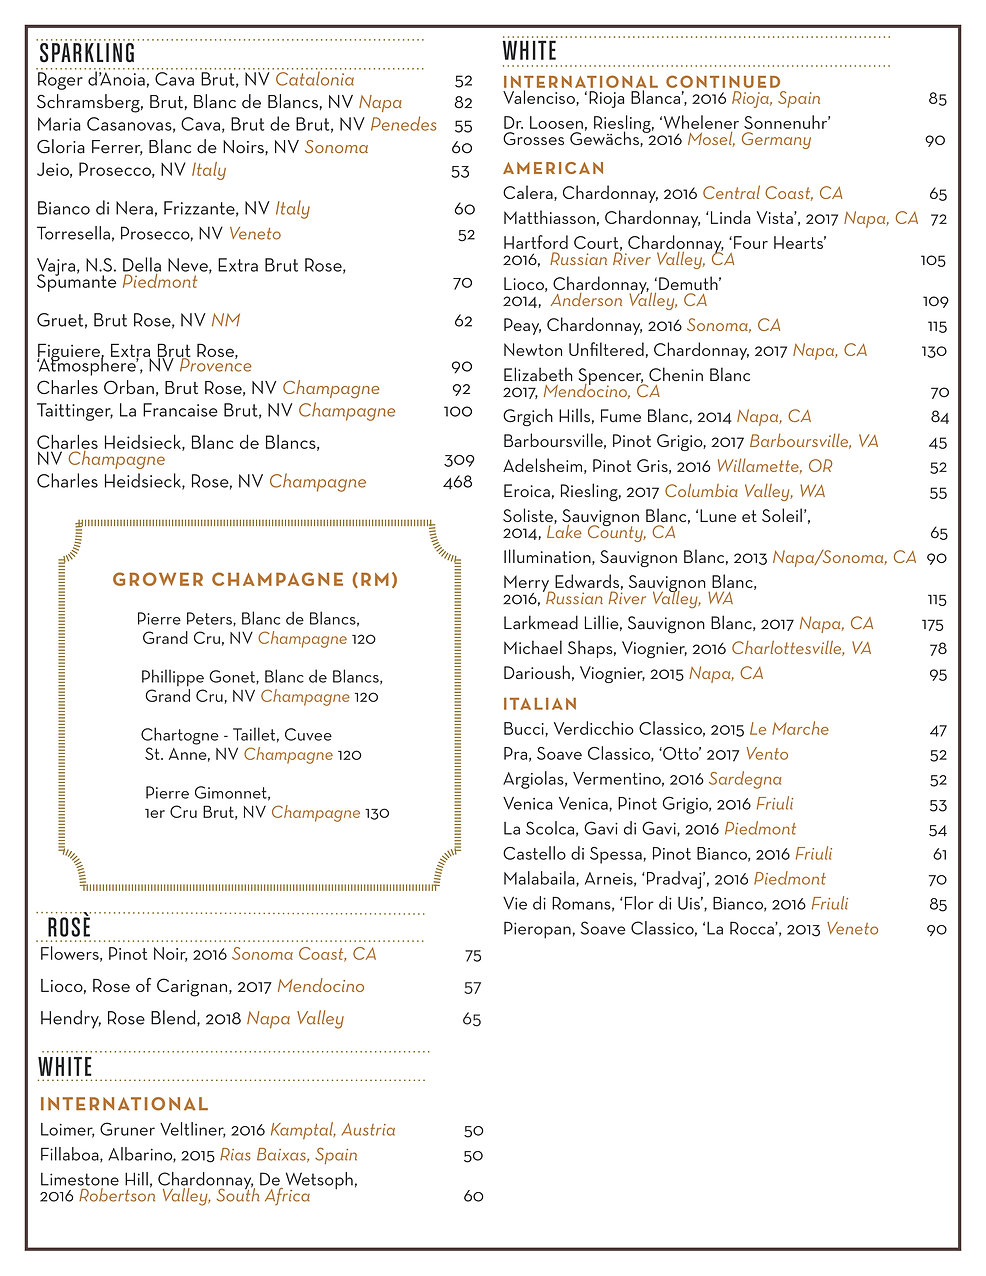 190829 Riggsby Wine List2.jpg